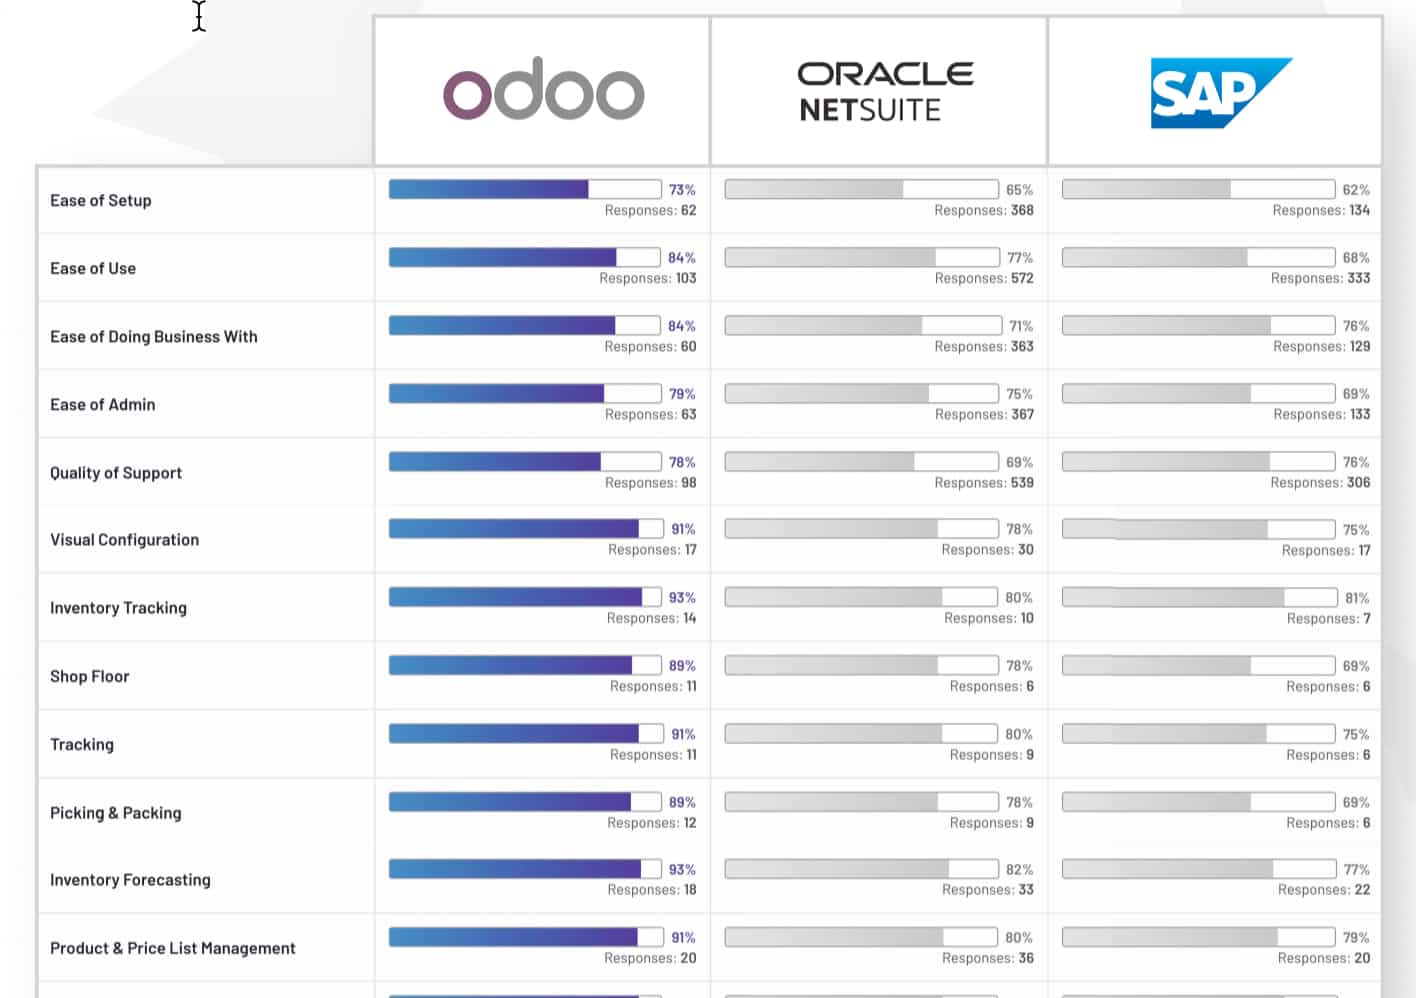 Odoo Satifaction Score